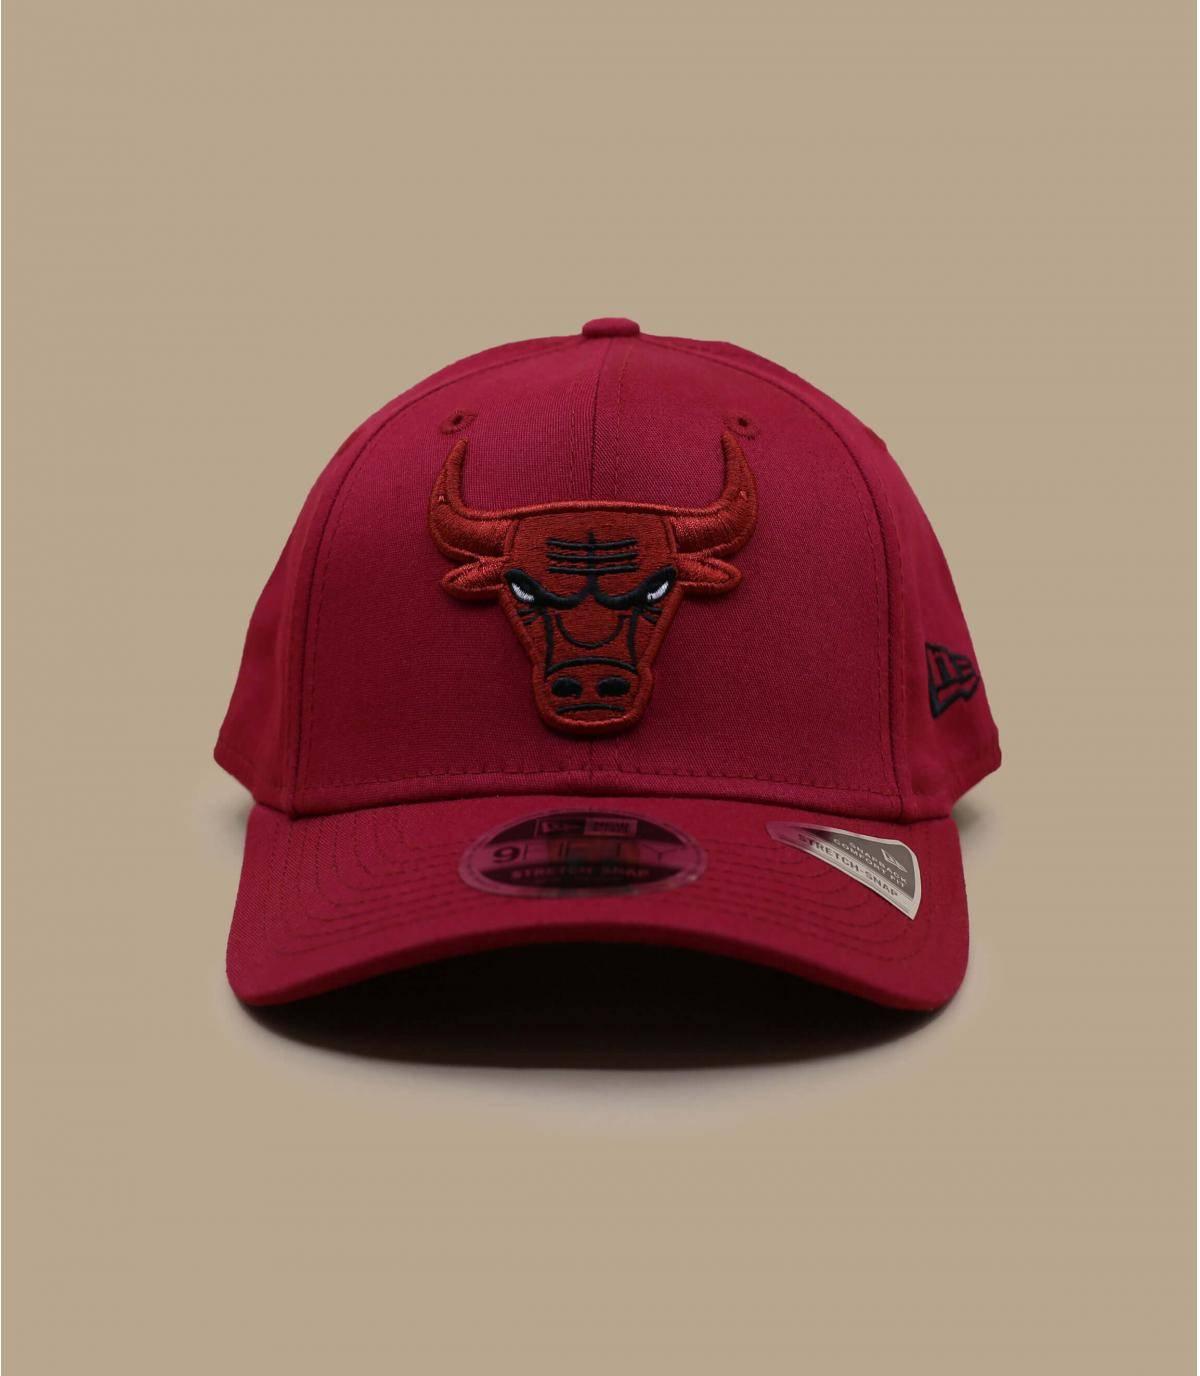 Details League Ess 950 Bulls cardinal - afbeeling 2